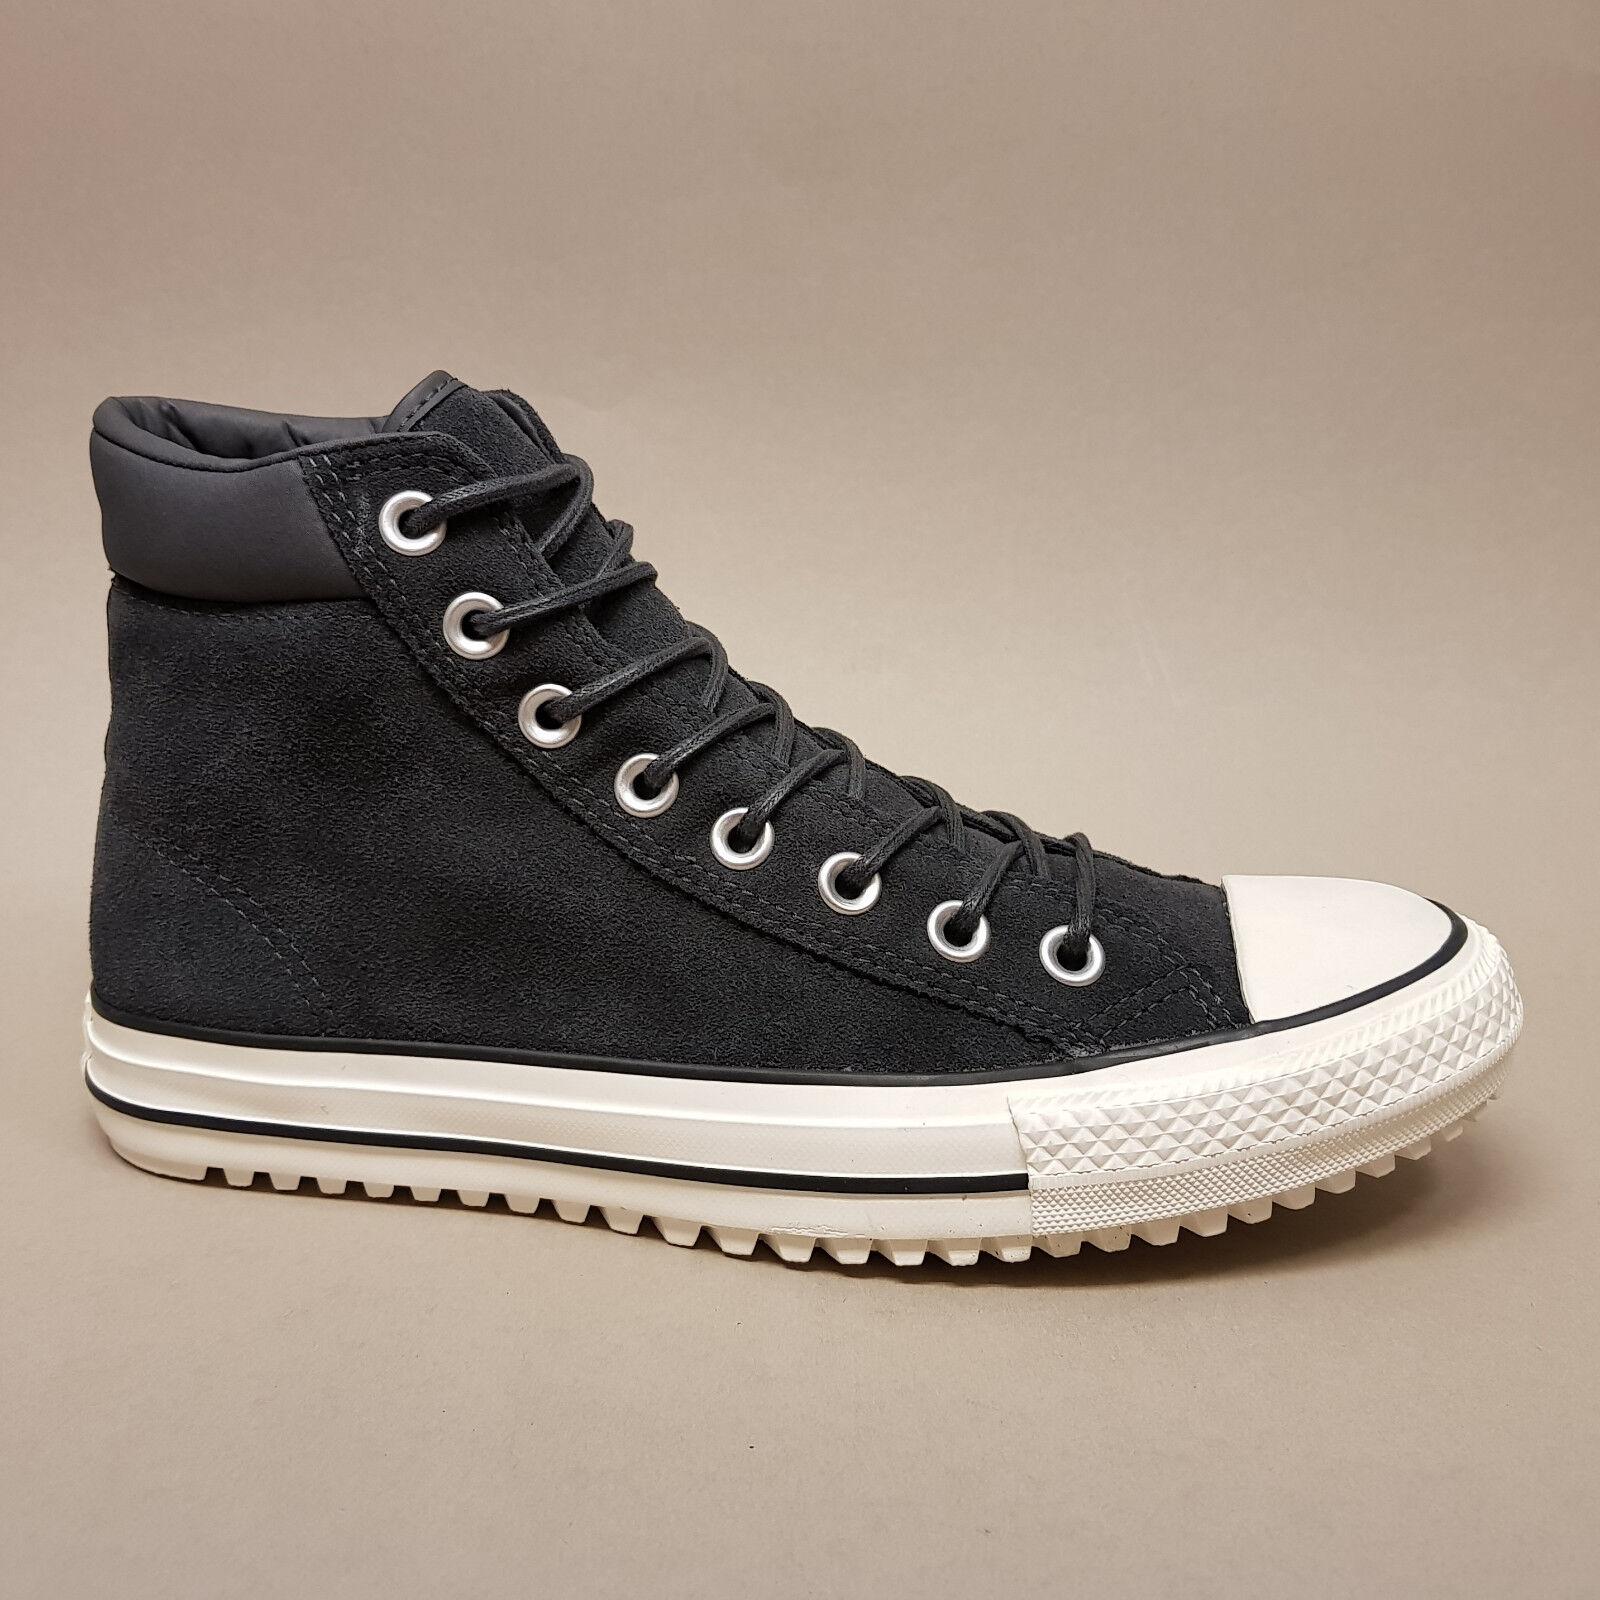 Converse All Star Chuck Hi Boot PC Black Egret 153675C Sneaker Wildleder schwarz